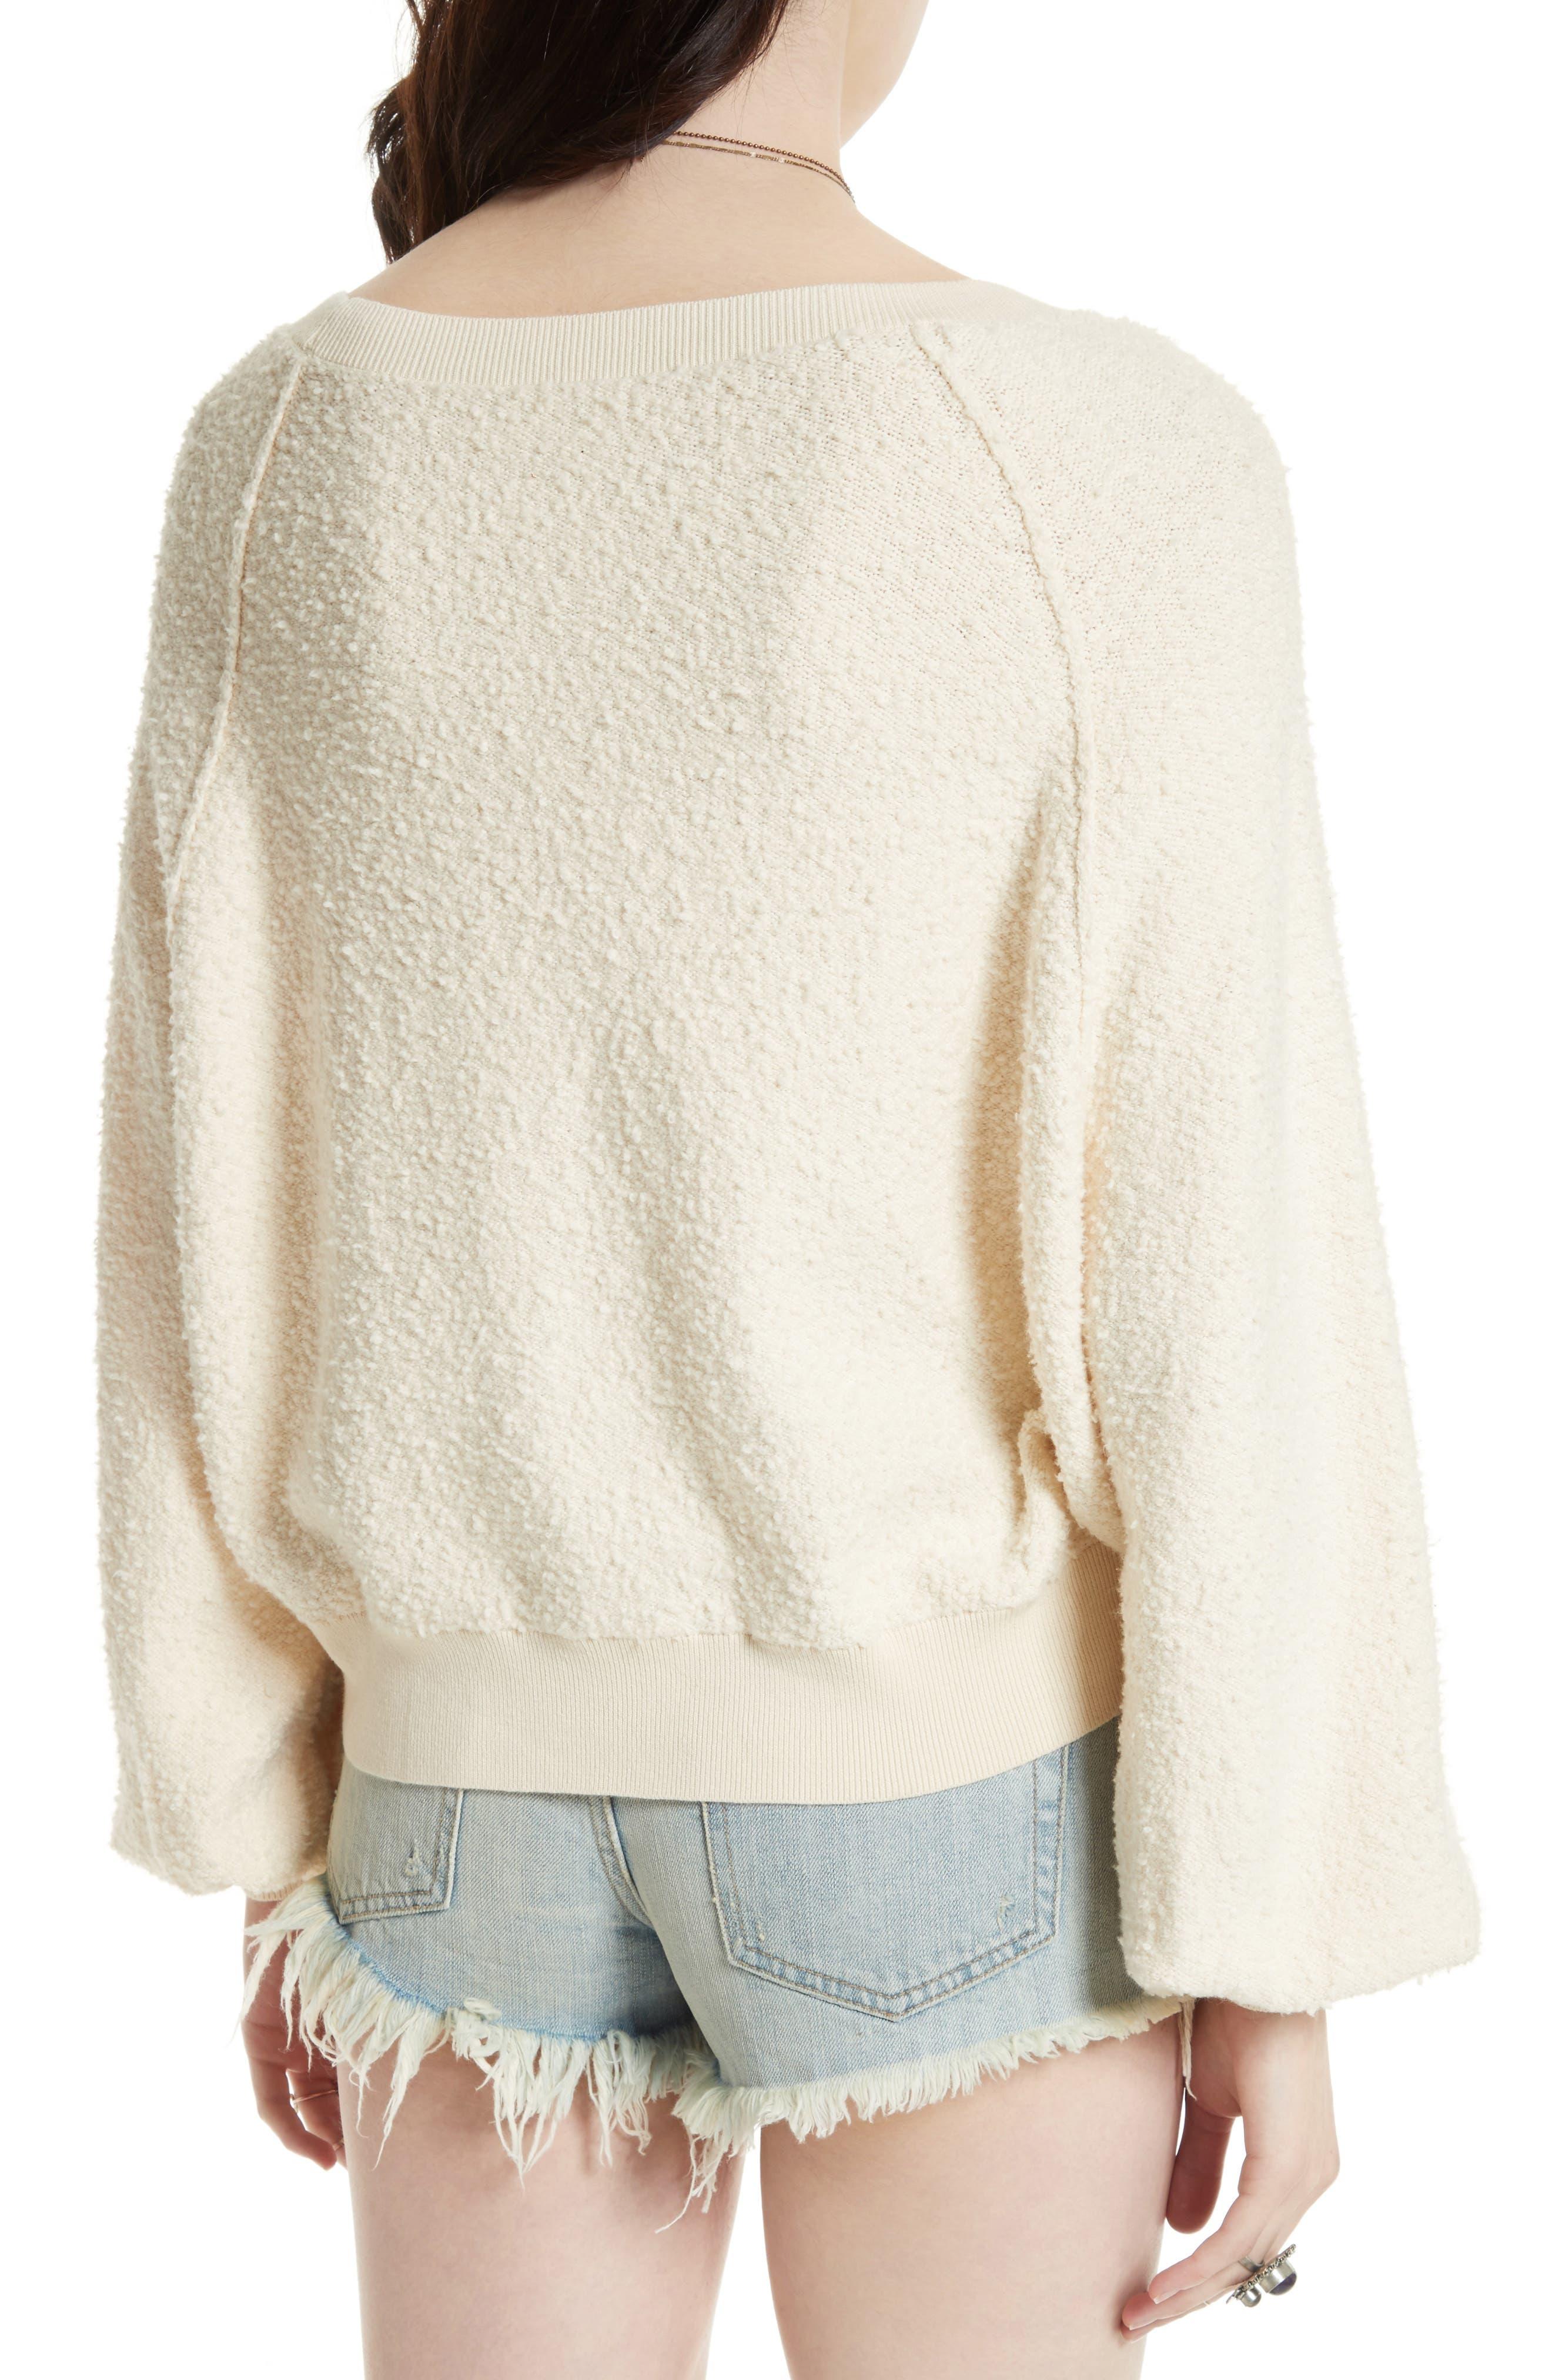 Found My Friend Sweatshirt,                             Alternate thumbnail 2, color,                             IVORY